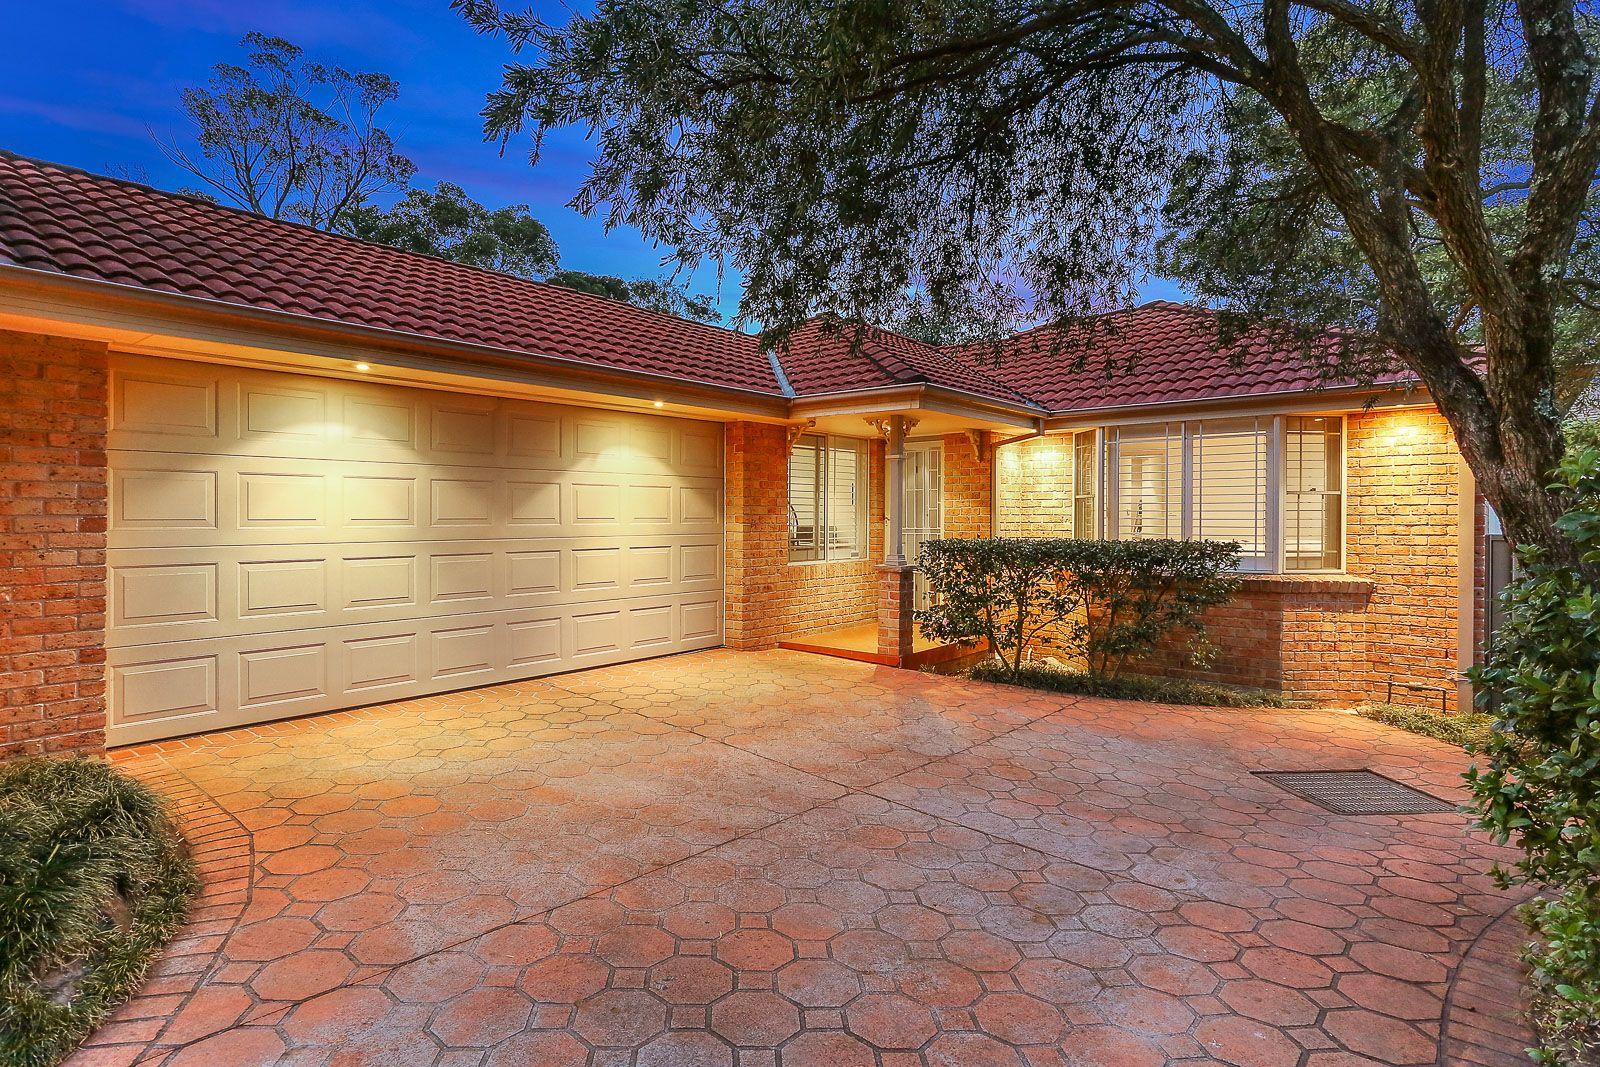 3/20 Winifred Avenue, Caringbah NSW 2229, Image 0